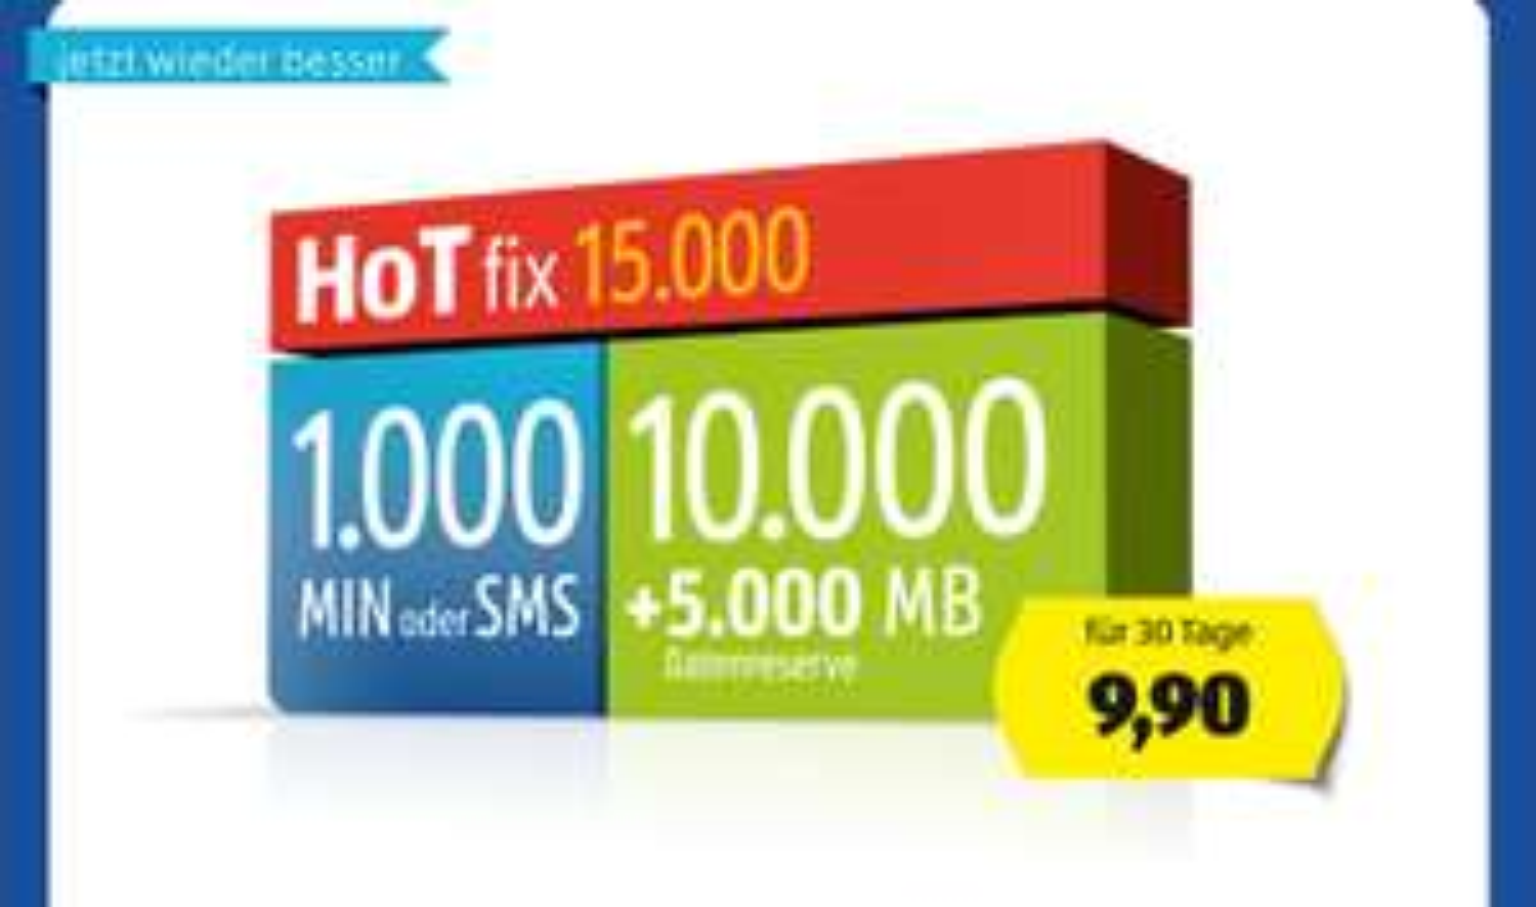 HoT fix jetzt mit 2 GB mehr (insgesamt 15 GB)